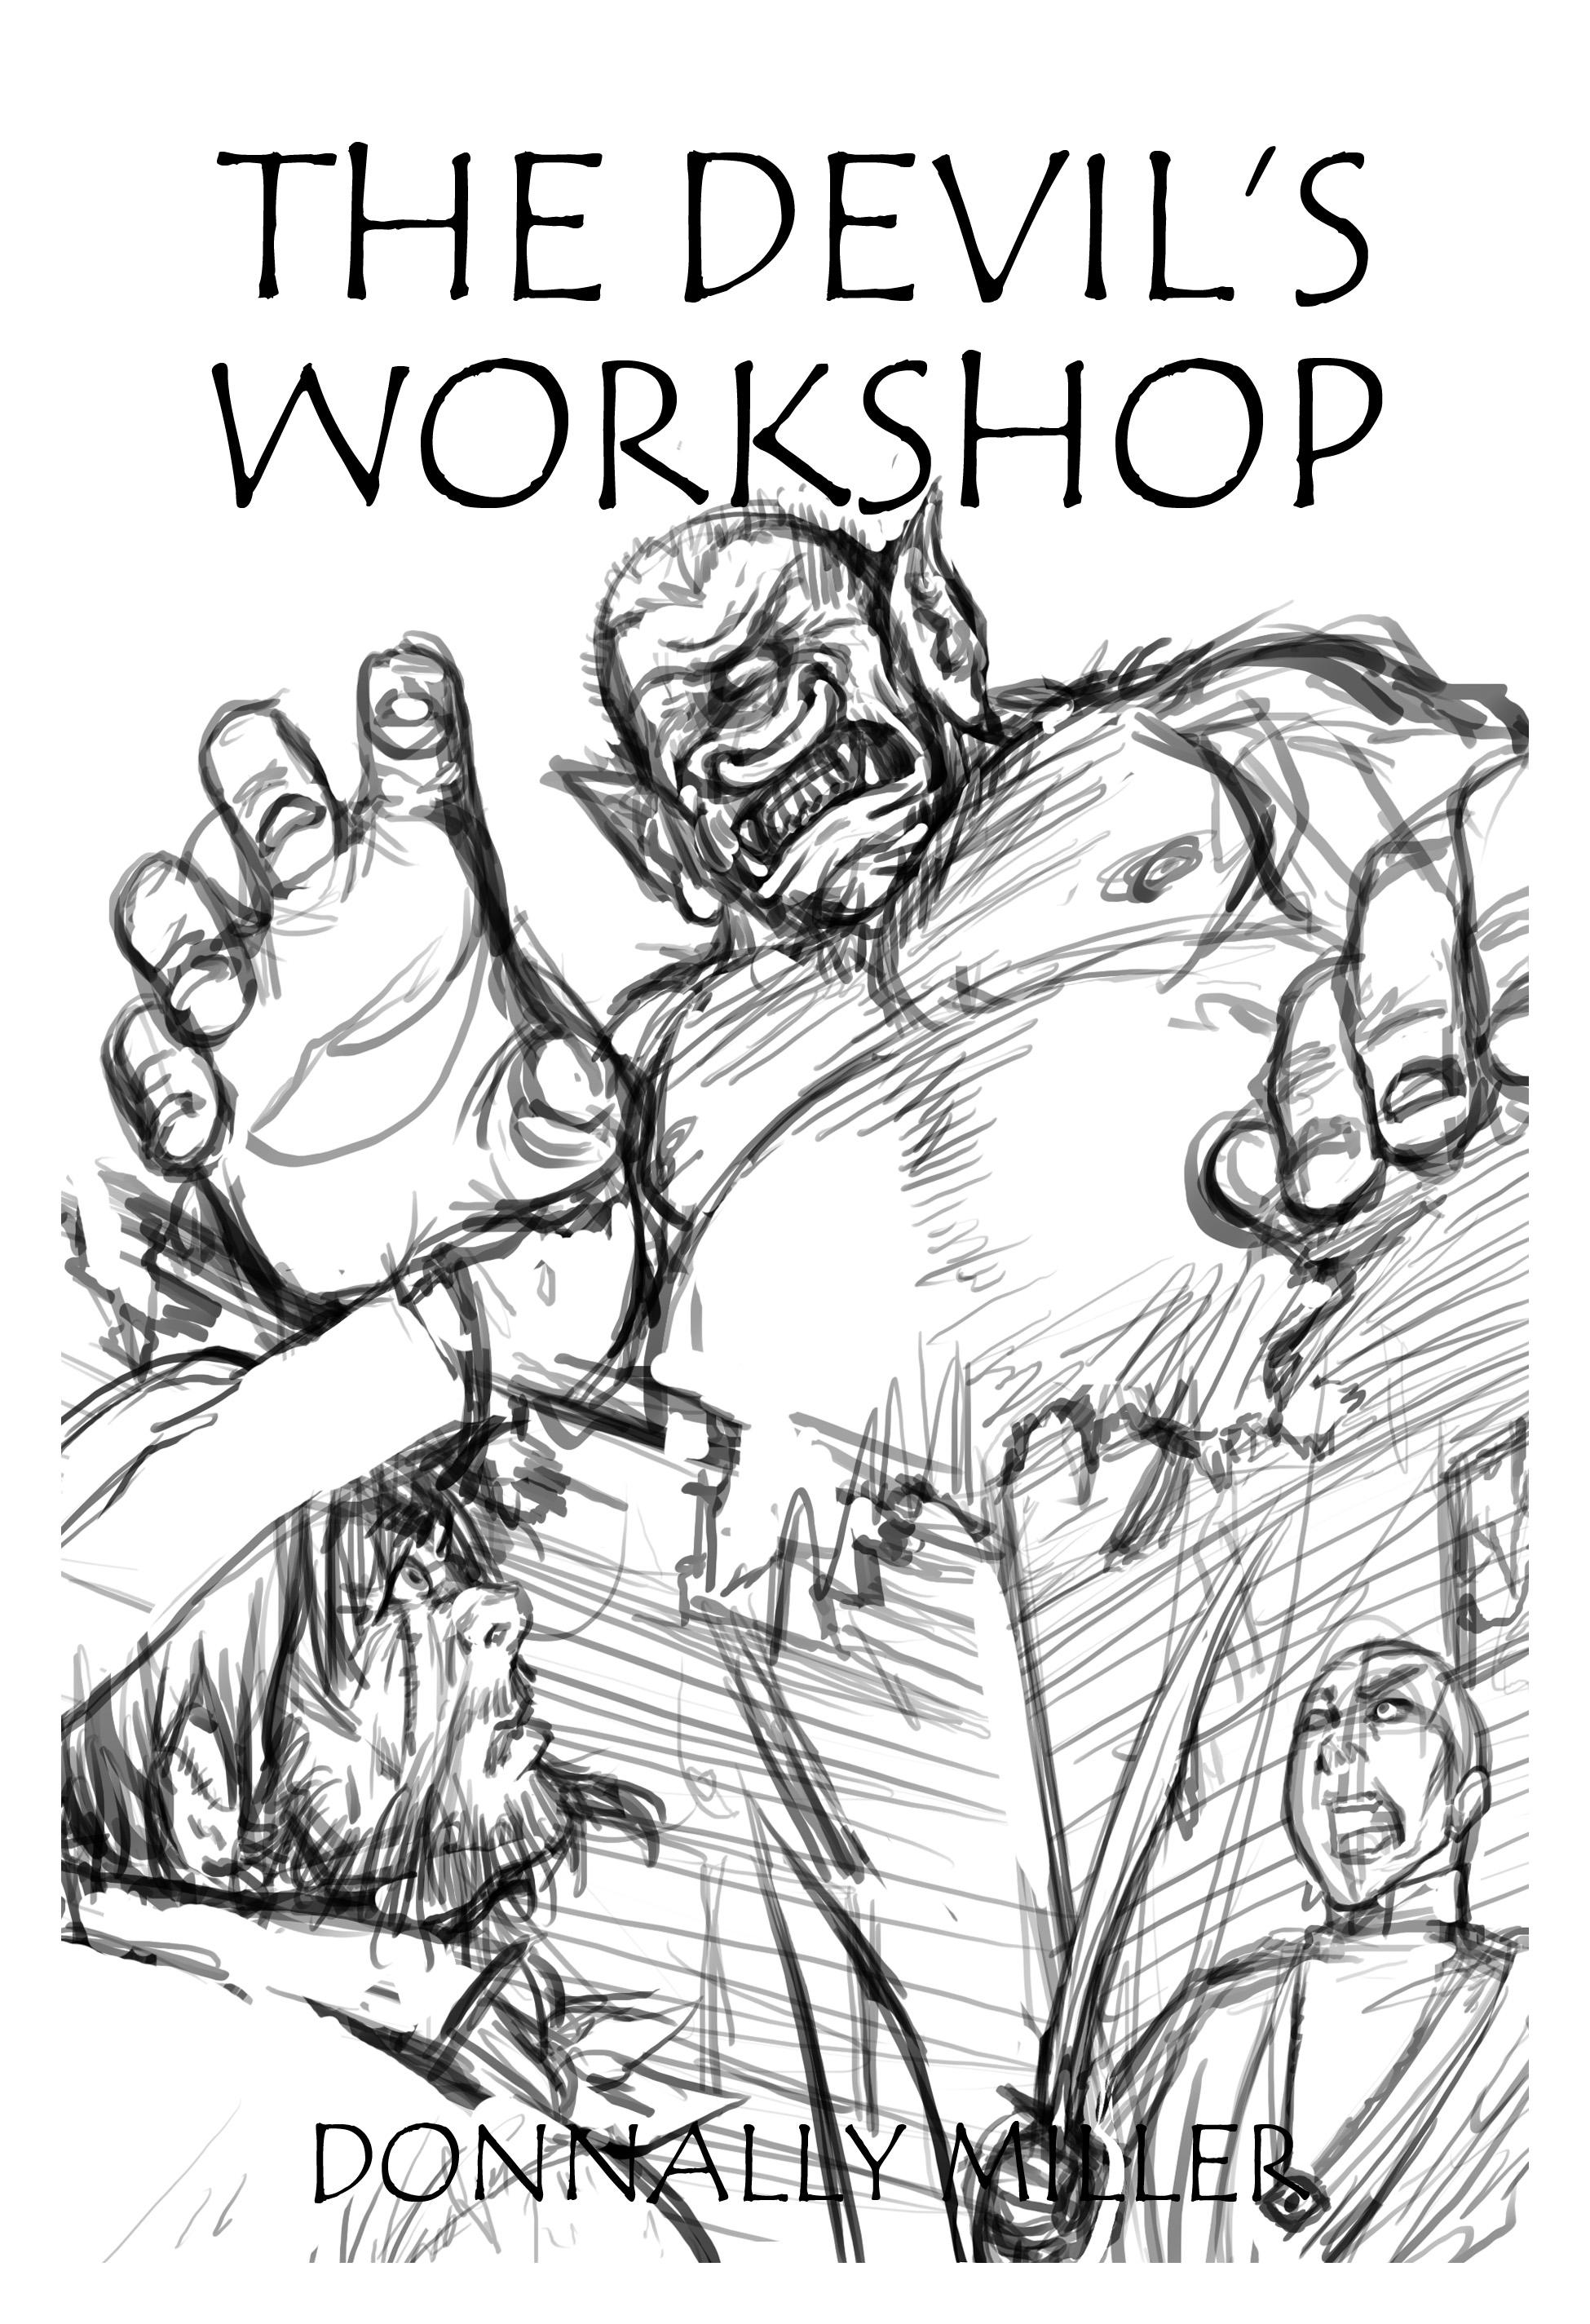 The Devil's Workshop cover_Final Draft.jpg